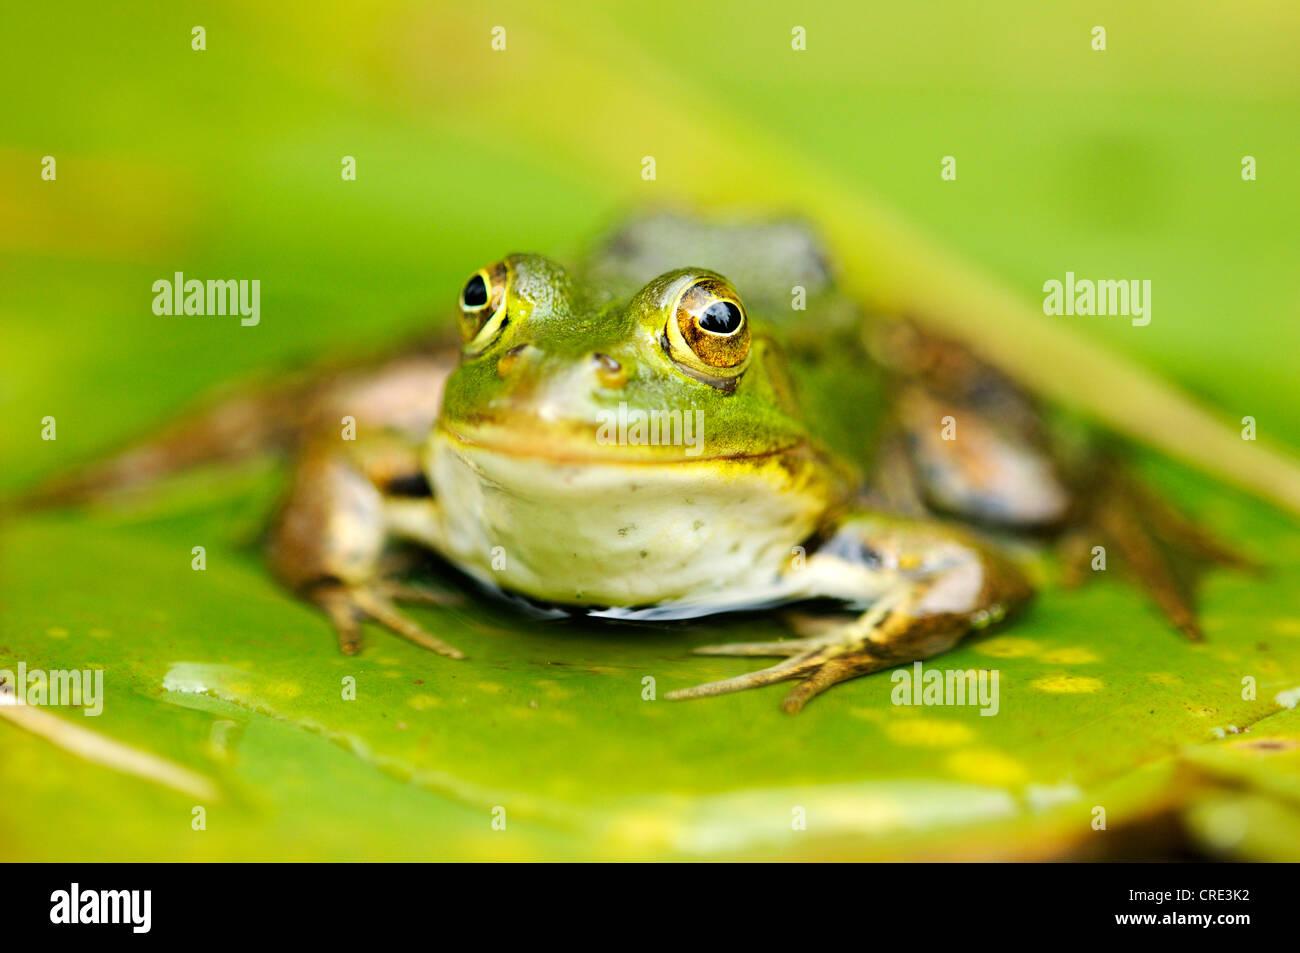 Pool Frog (Rana lessonae), sitting on a leaf, Selegermoor bog, Zurich, Switzerland, Europe - Stock Image